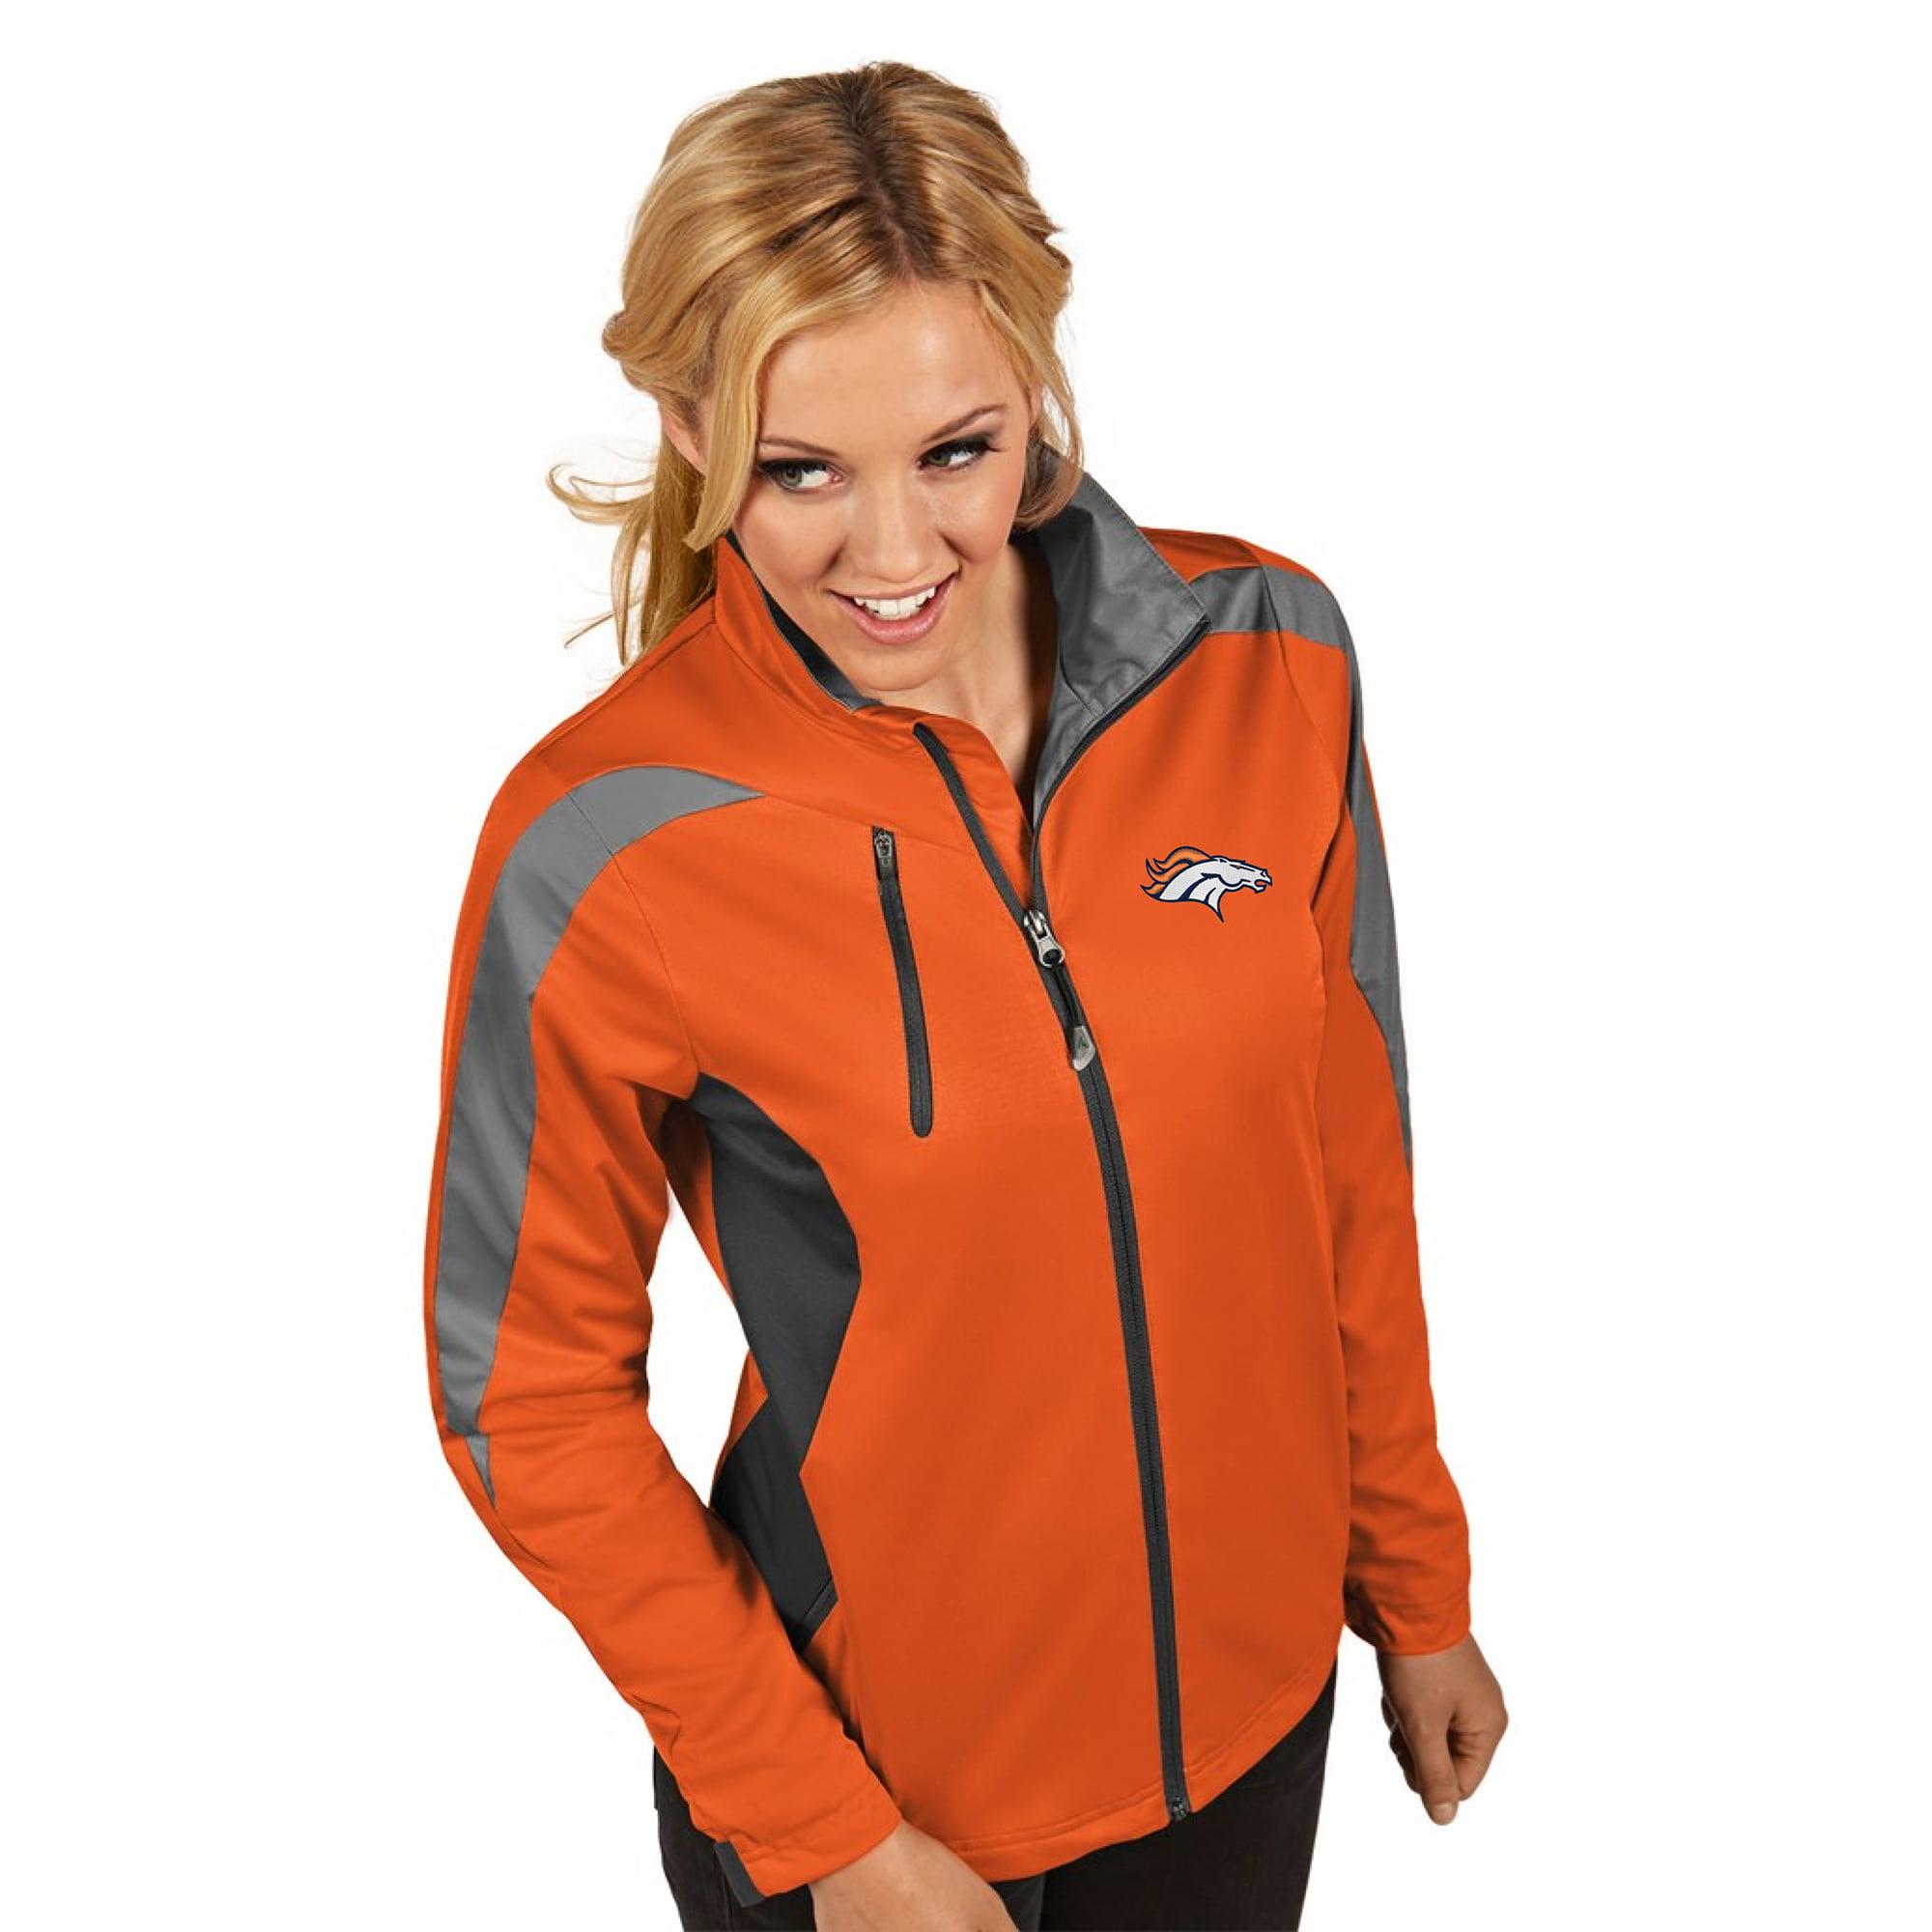 Denver Broncos Women's Antigua Discover Full-Zip Jacket - Orange - S